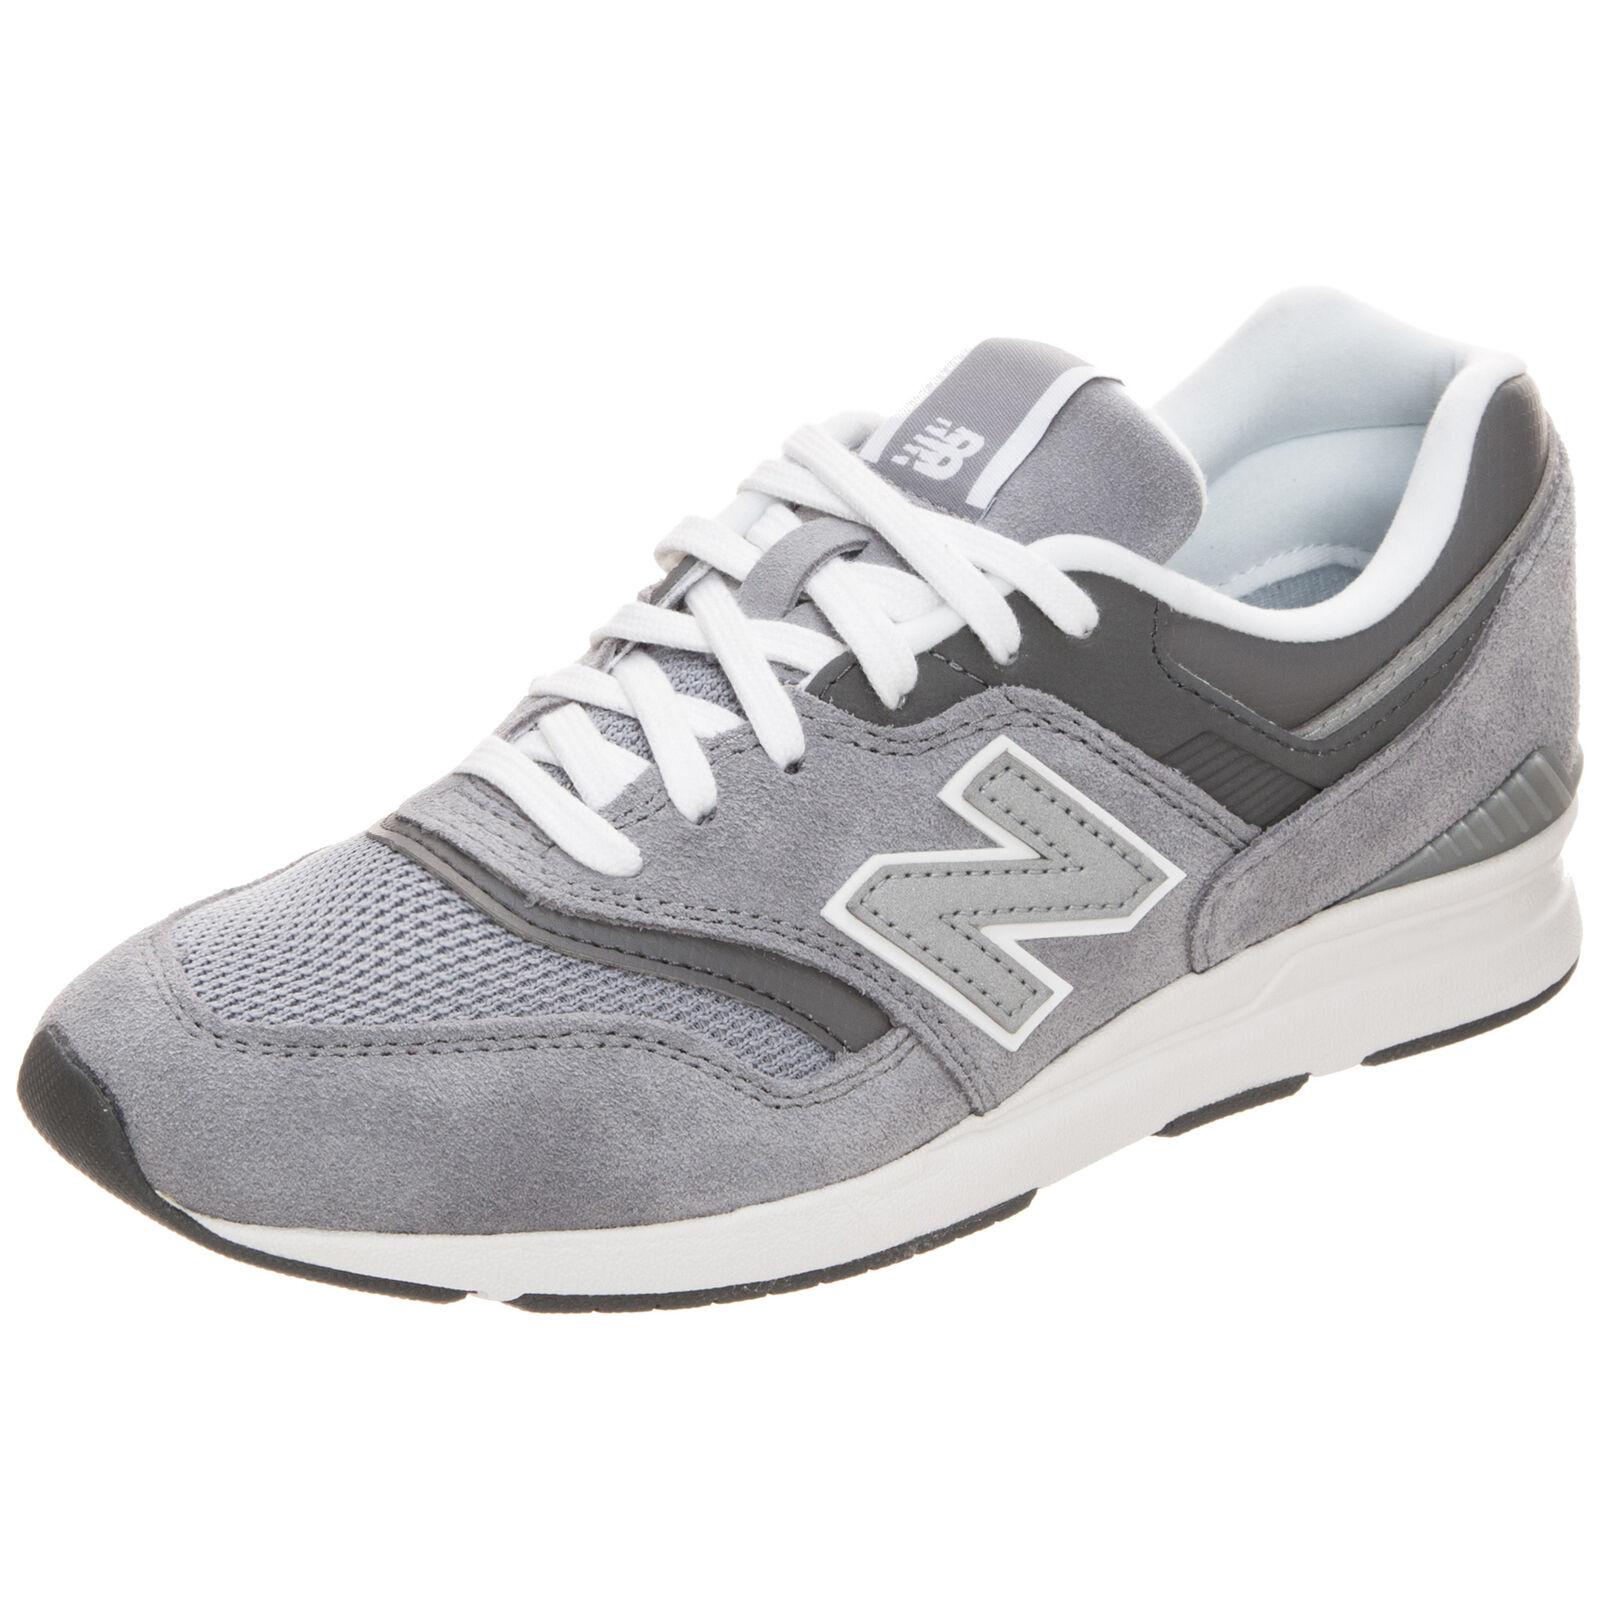 New Balance WL697-CR-B Turnschuhe Damen Grau NEU Schuhe Turnschuhe